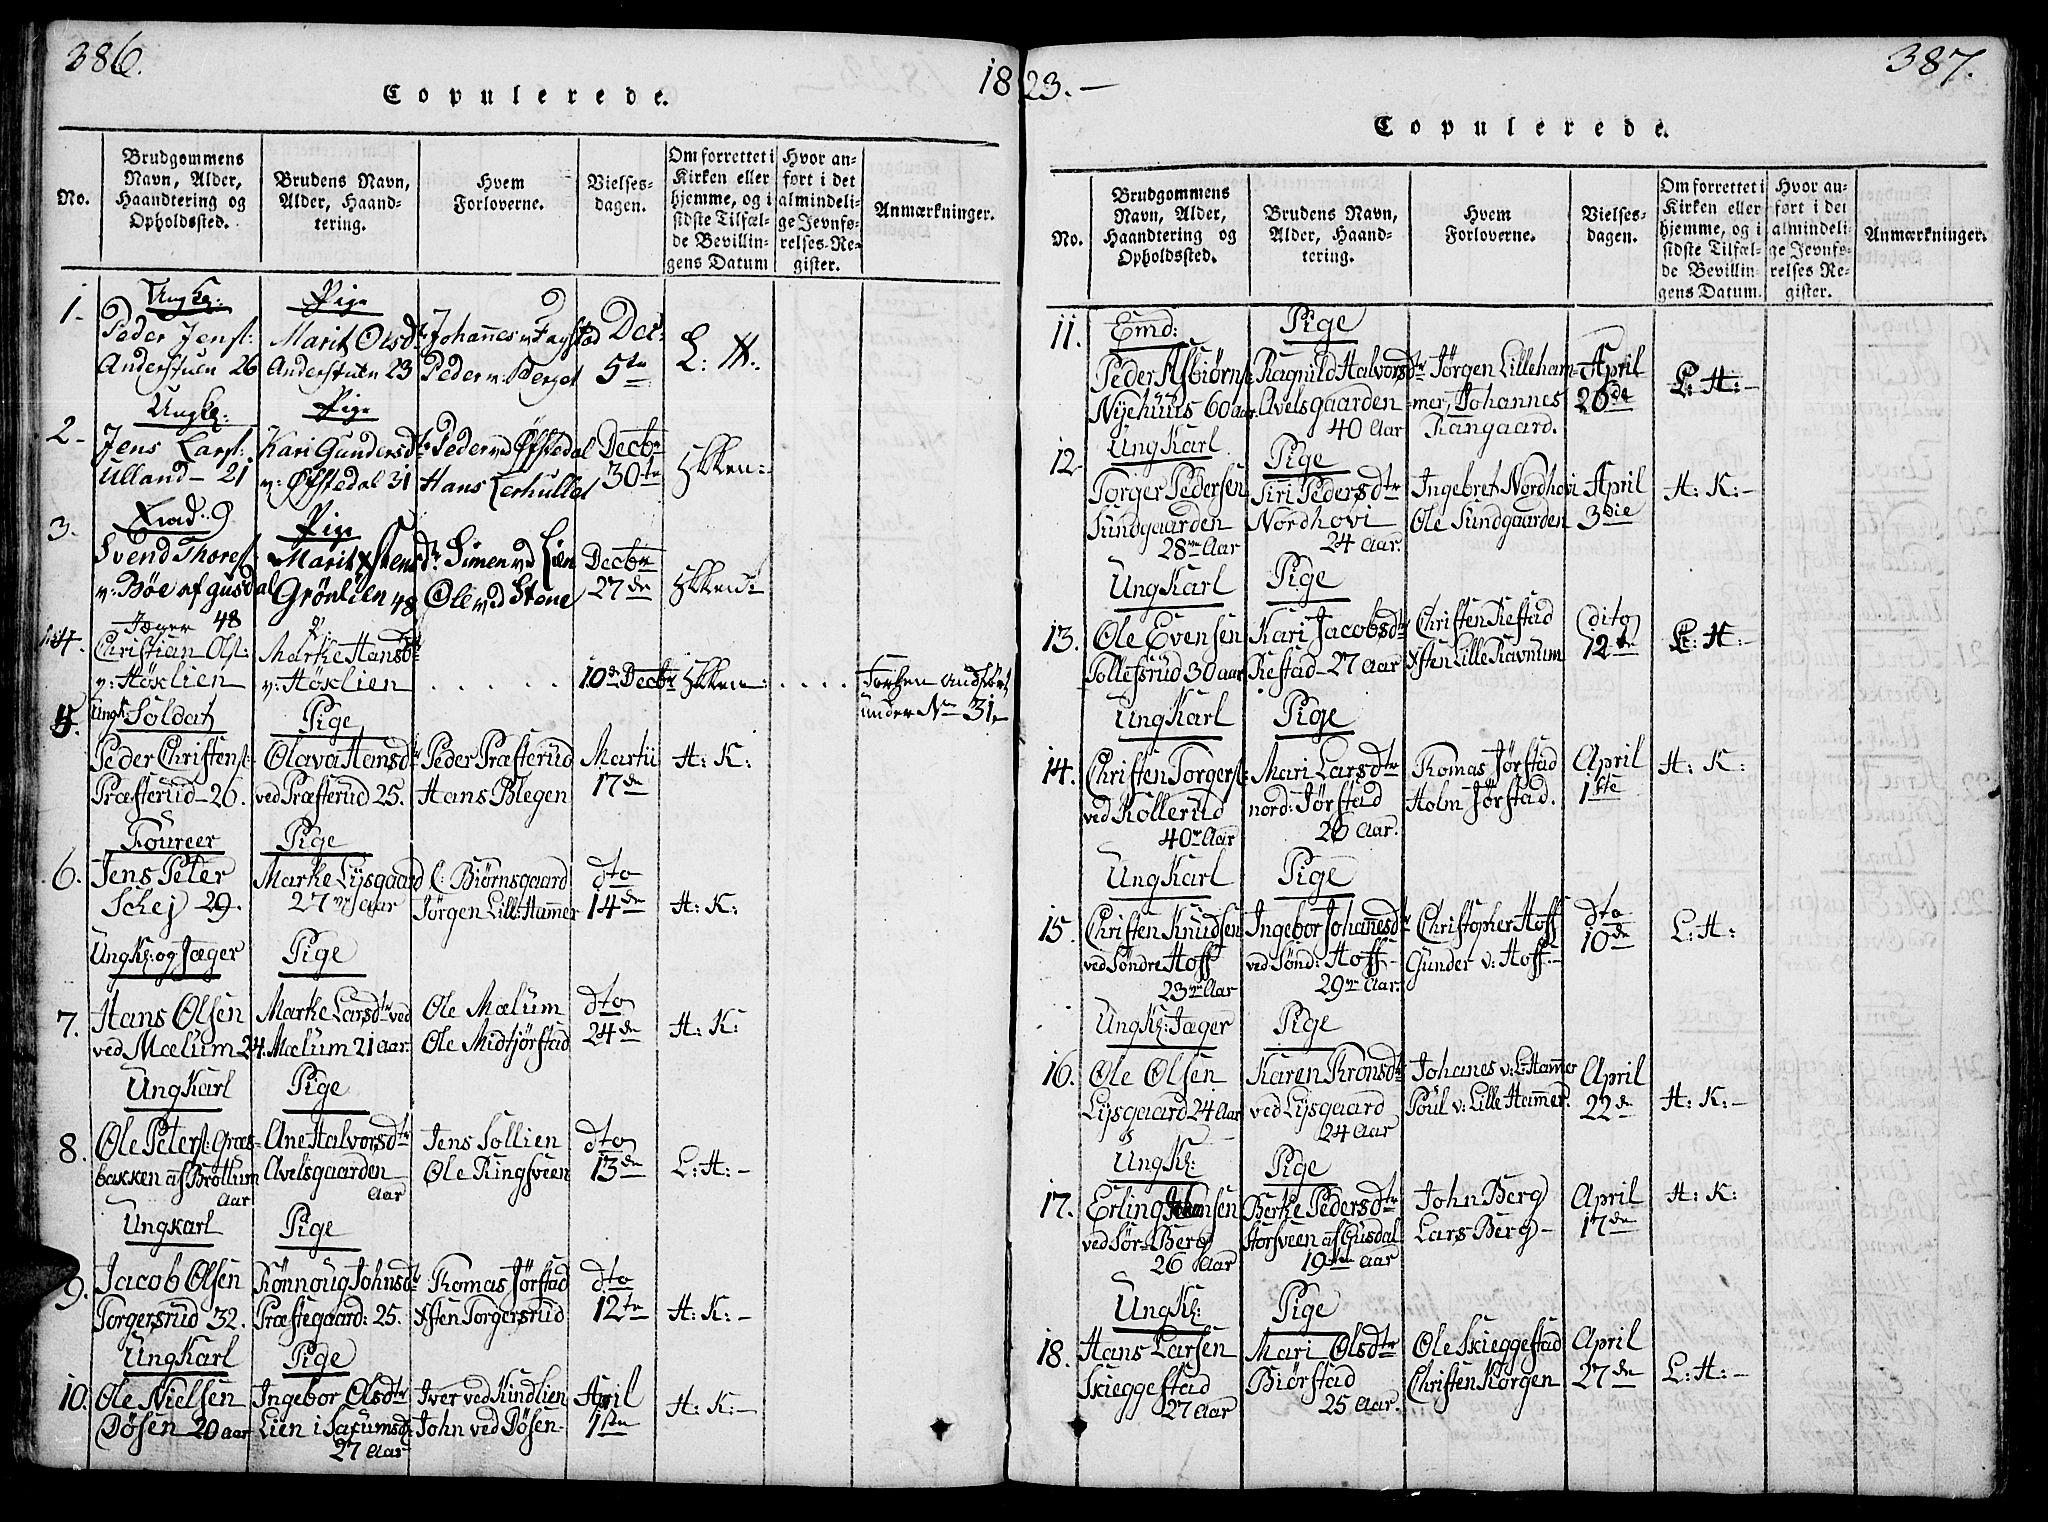 SAH, Fåberg prestekontor, Klokkerbok nr. 4, 1818-1837, s. 386-387